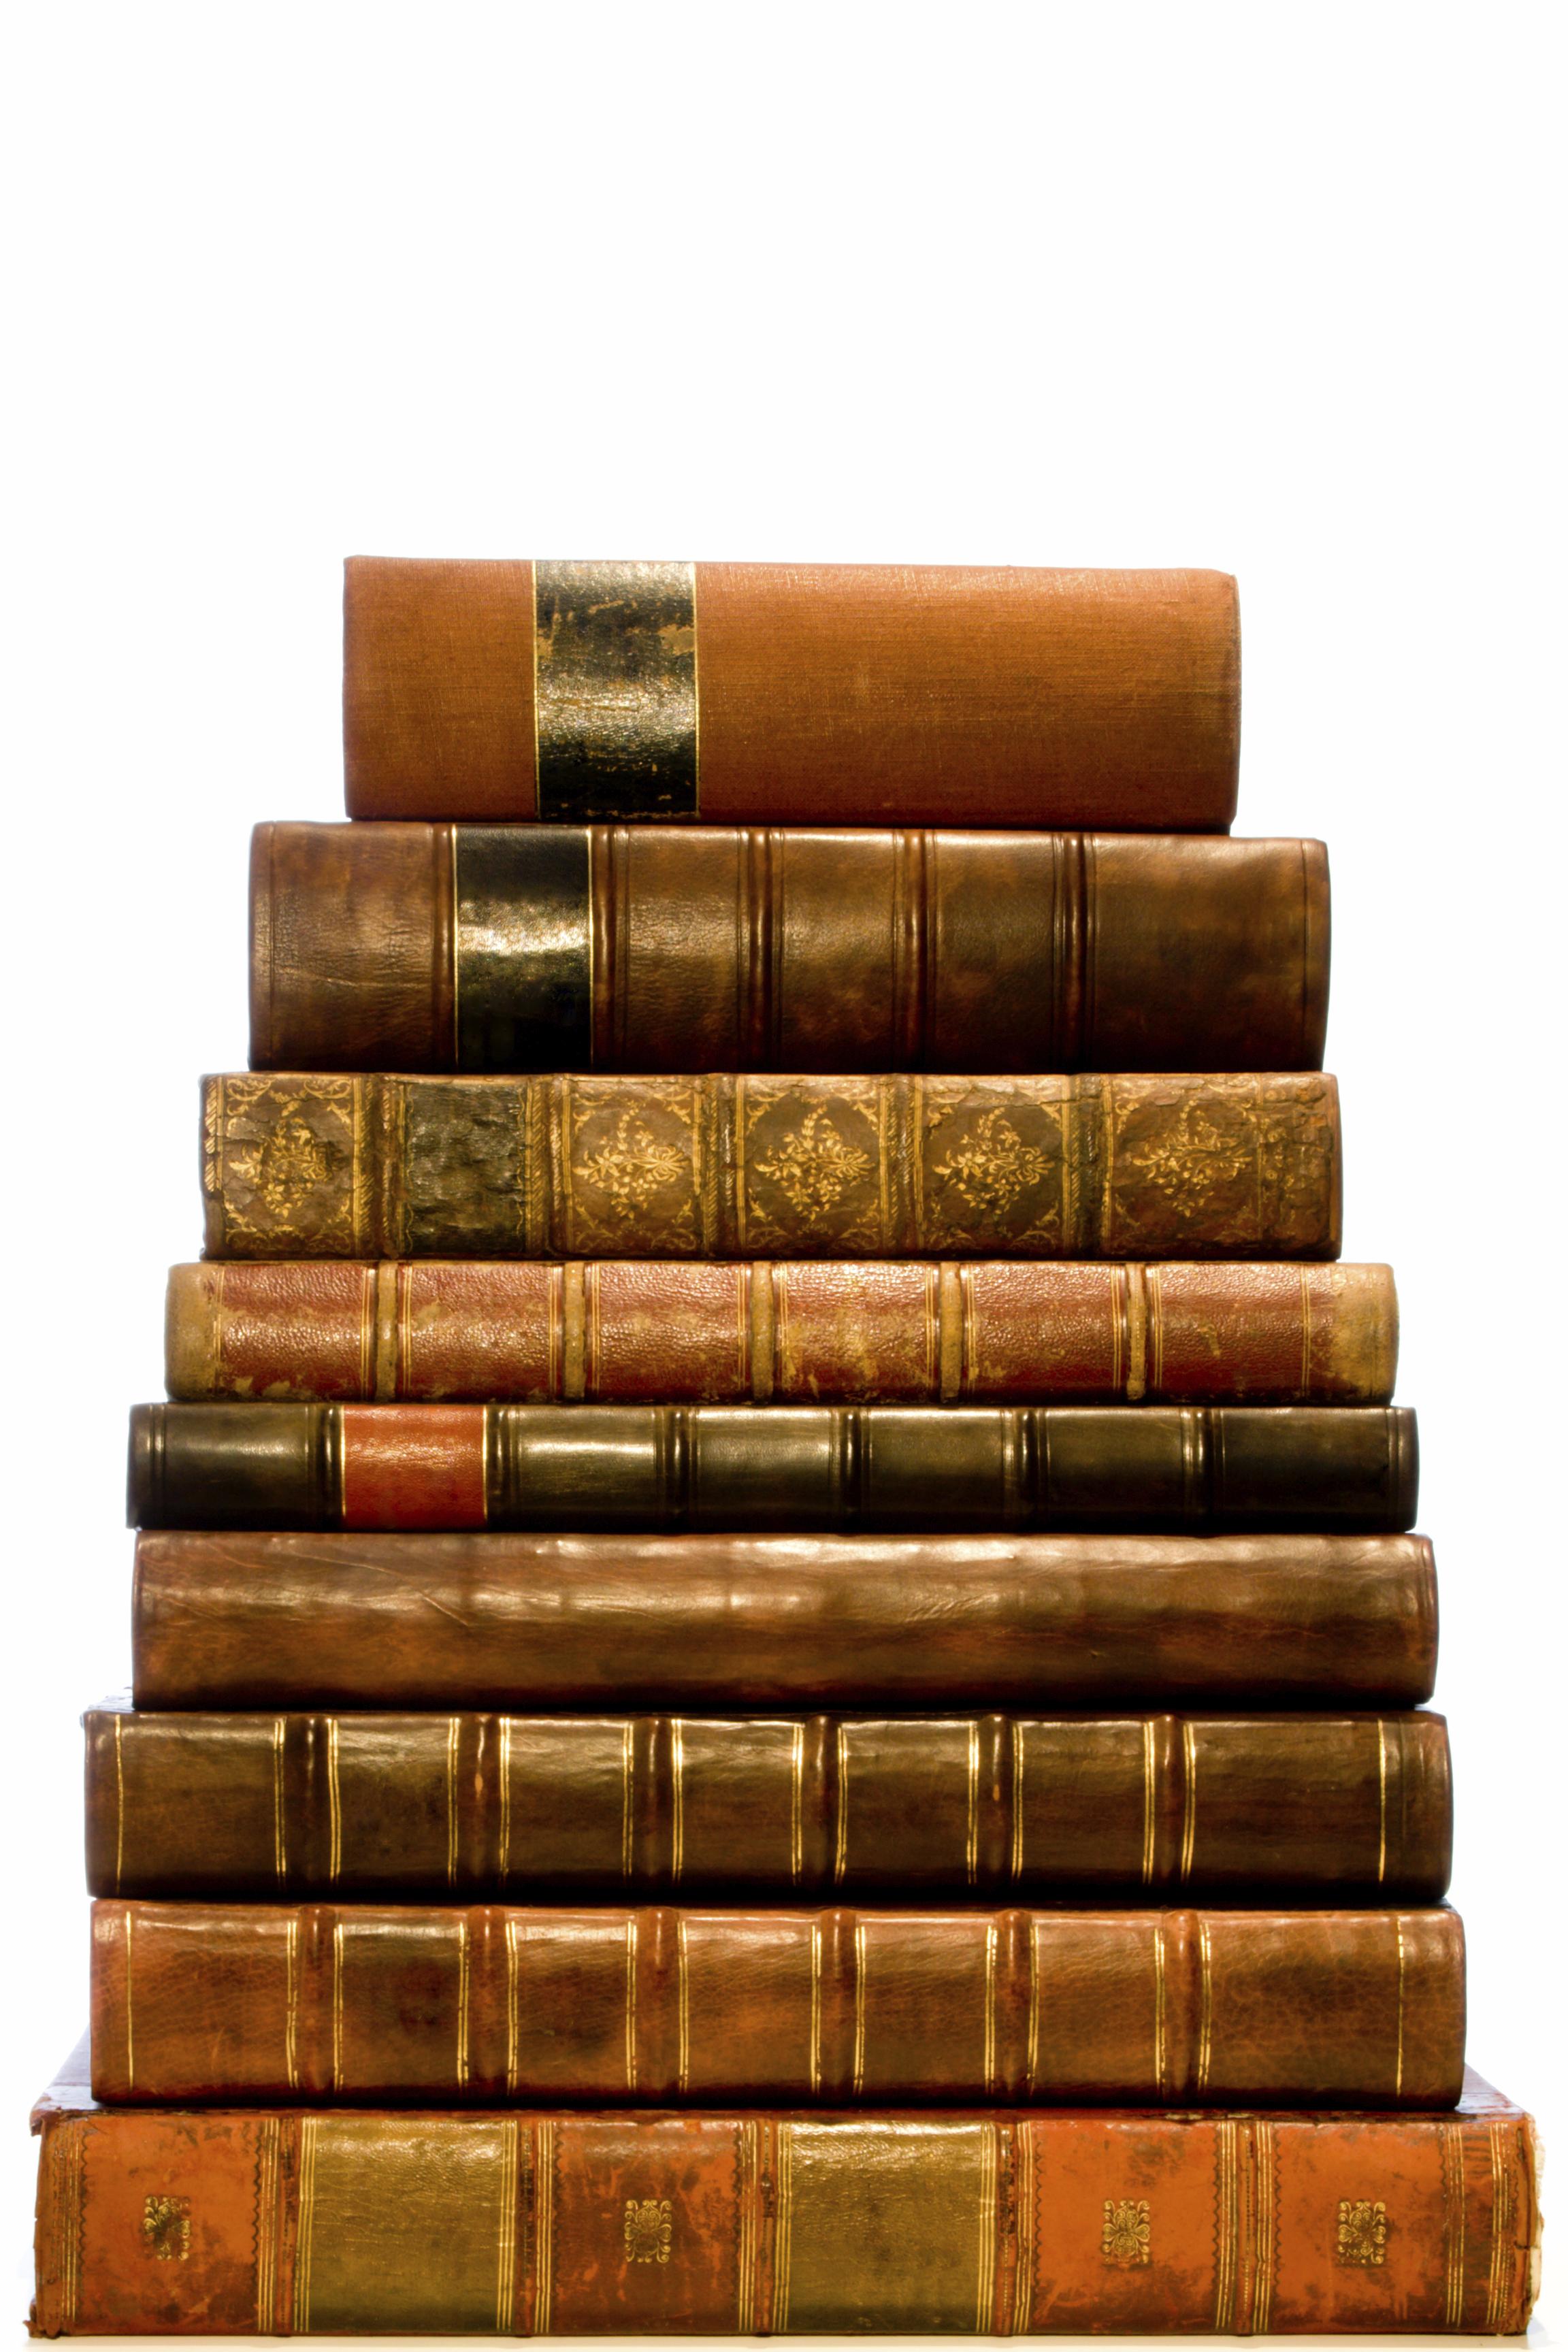 Vintage Tea Party and Book Swap | Greener Kirkcaldy